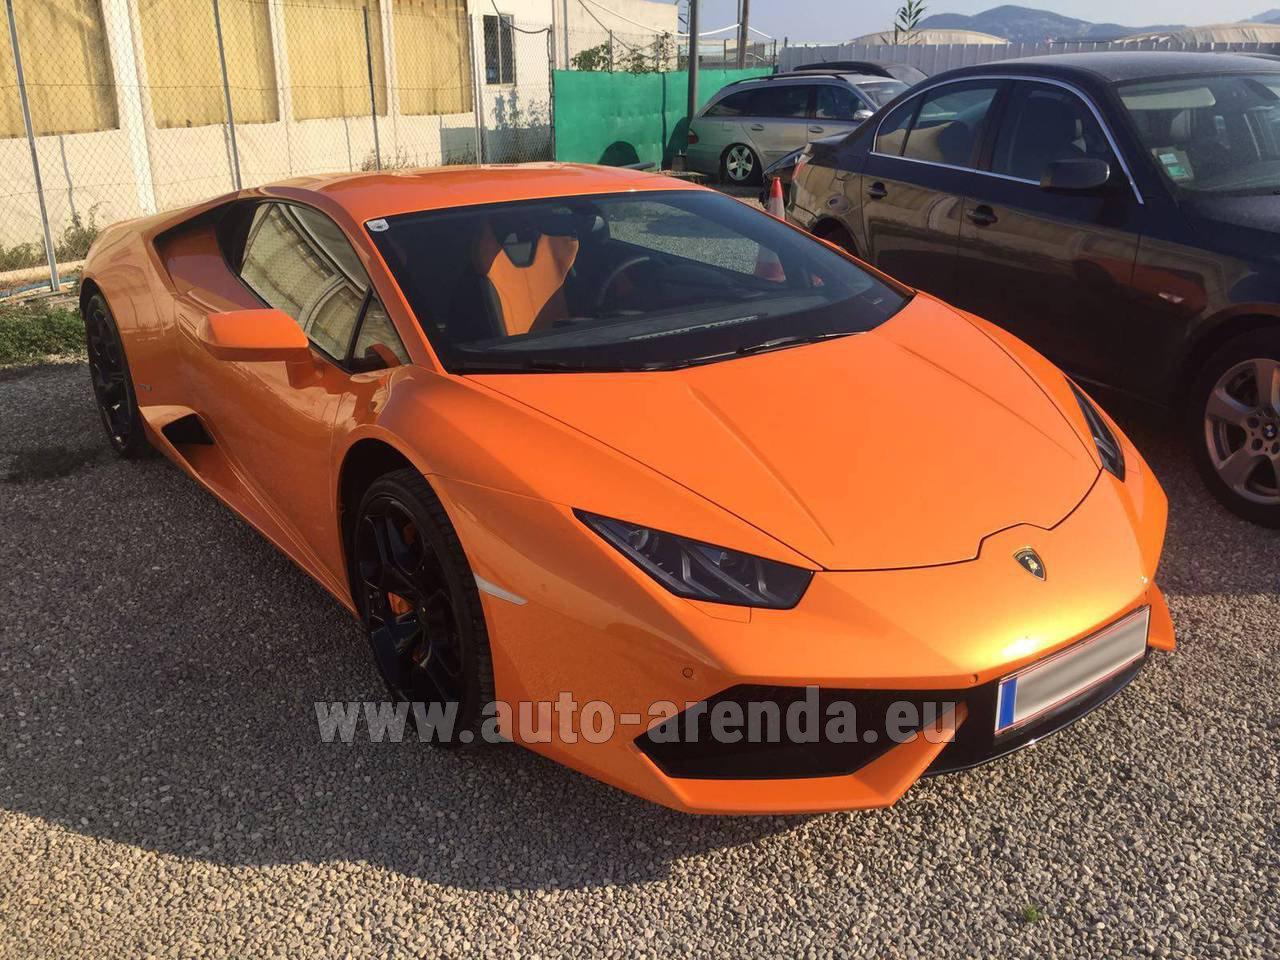 M 252 Nchen Bayern Lamborghini Huracan Lp 610 4 Orange Rental